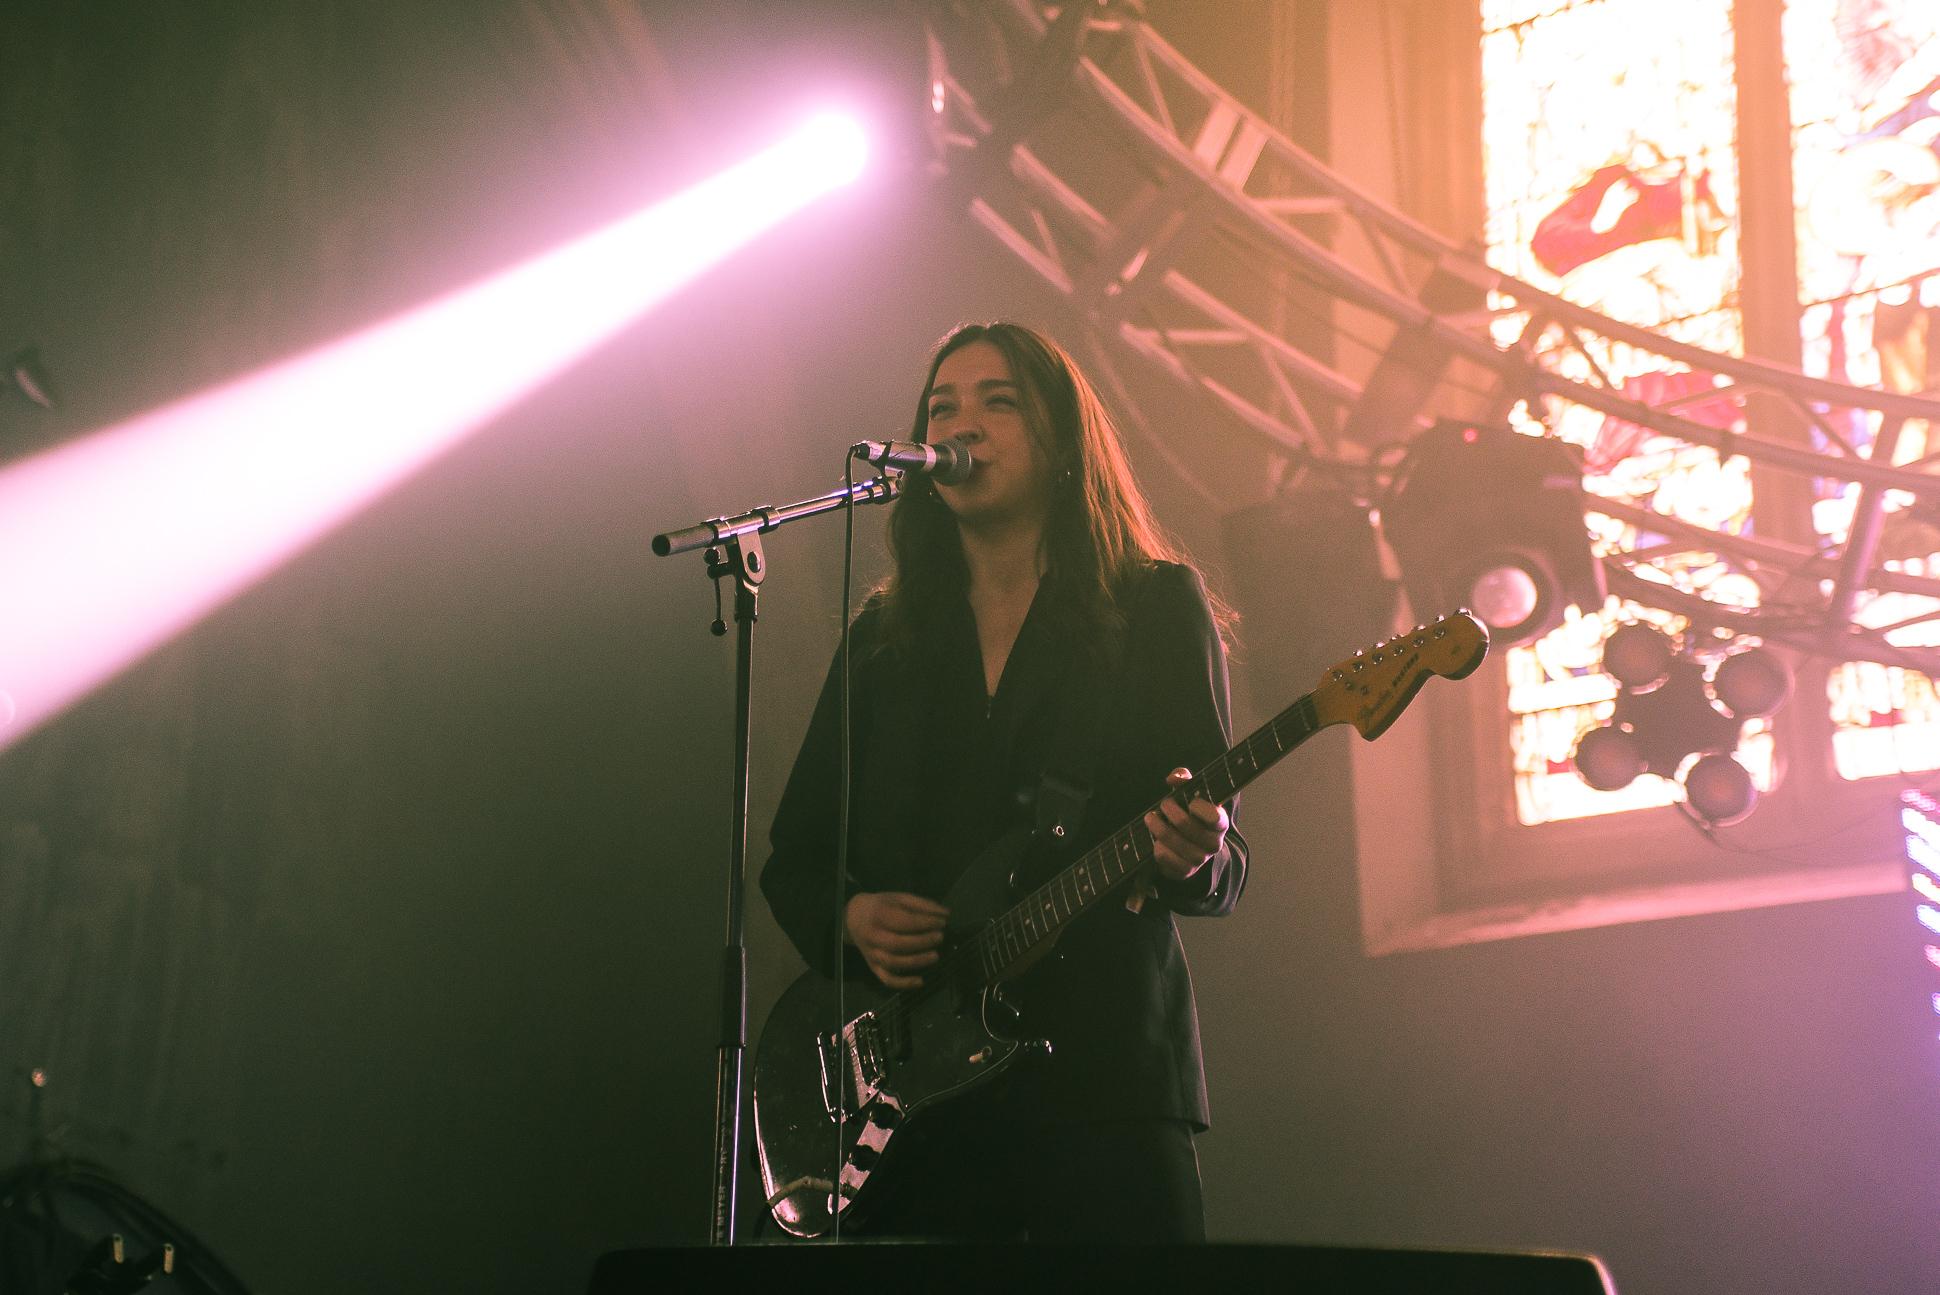 Live At Leeds 2019 - The Mysterines-2.jpg